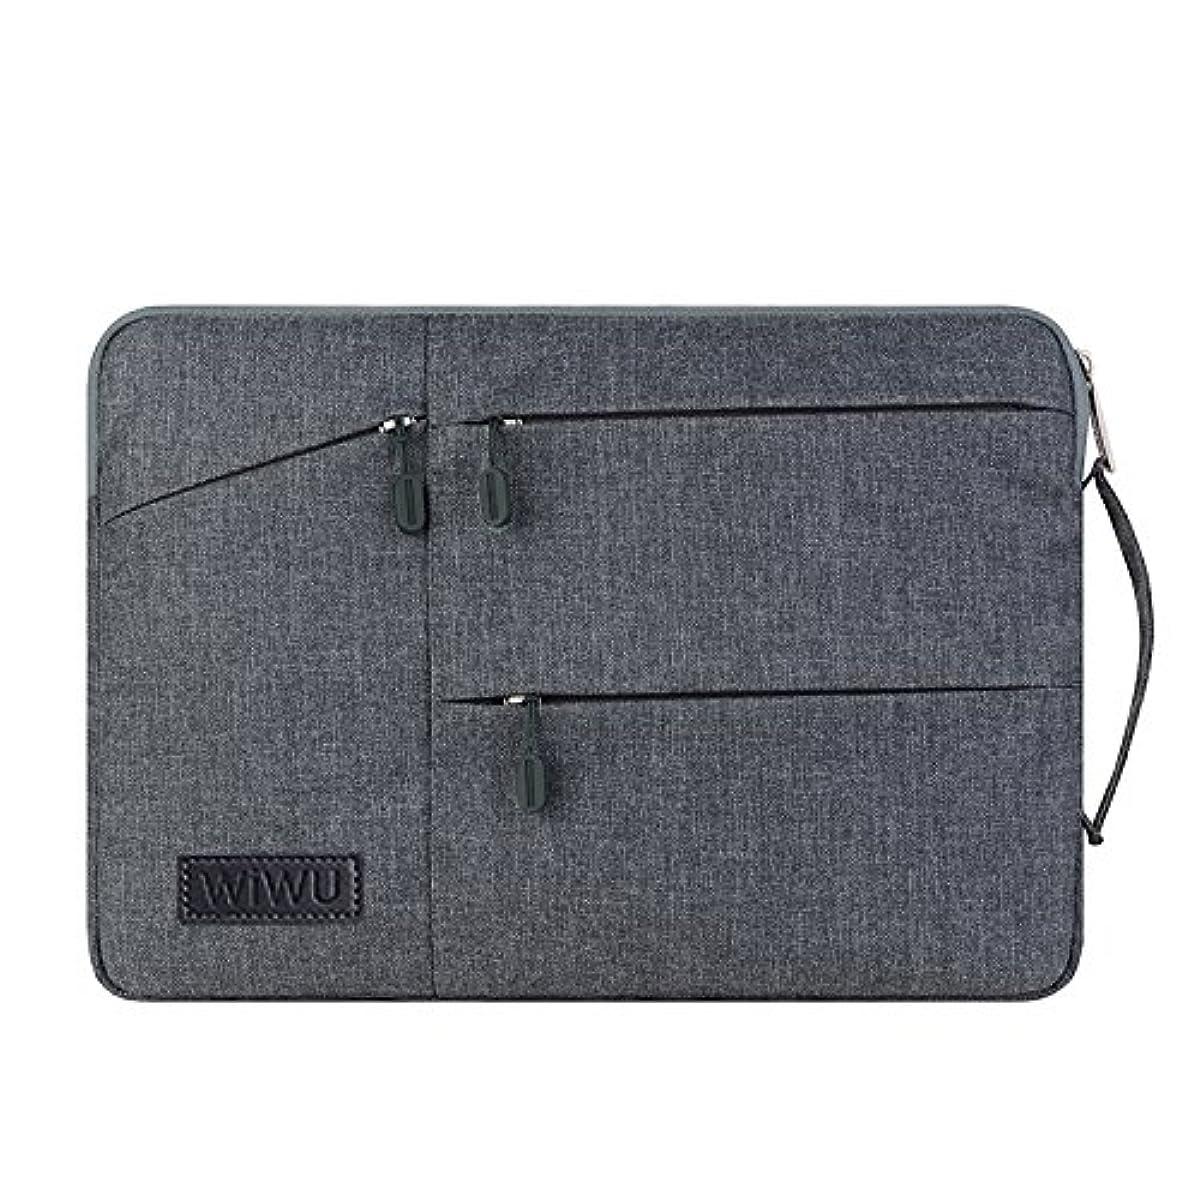 WIWU Laptop Sleeve Case Bag Carry Bag Hand Bag 13 inch for Macbook 13